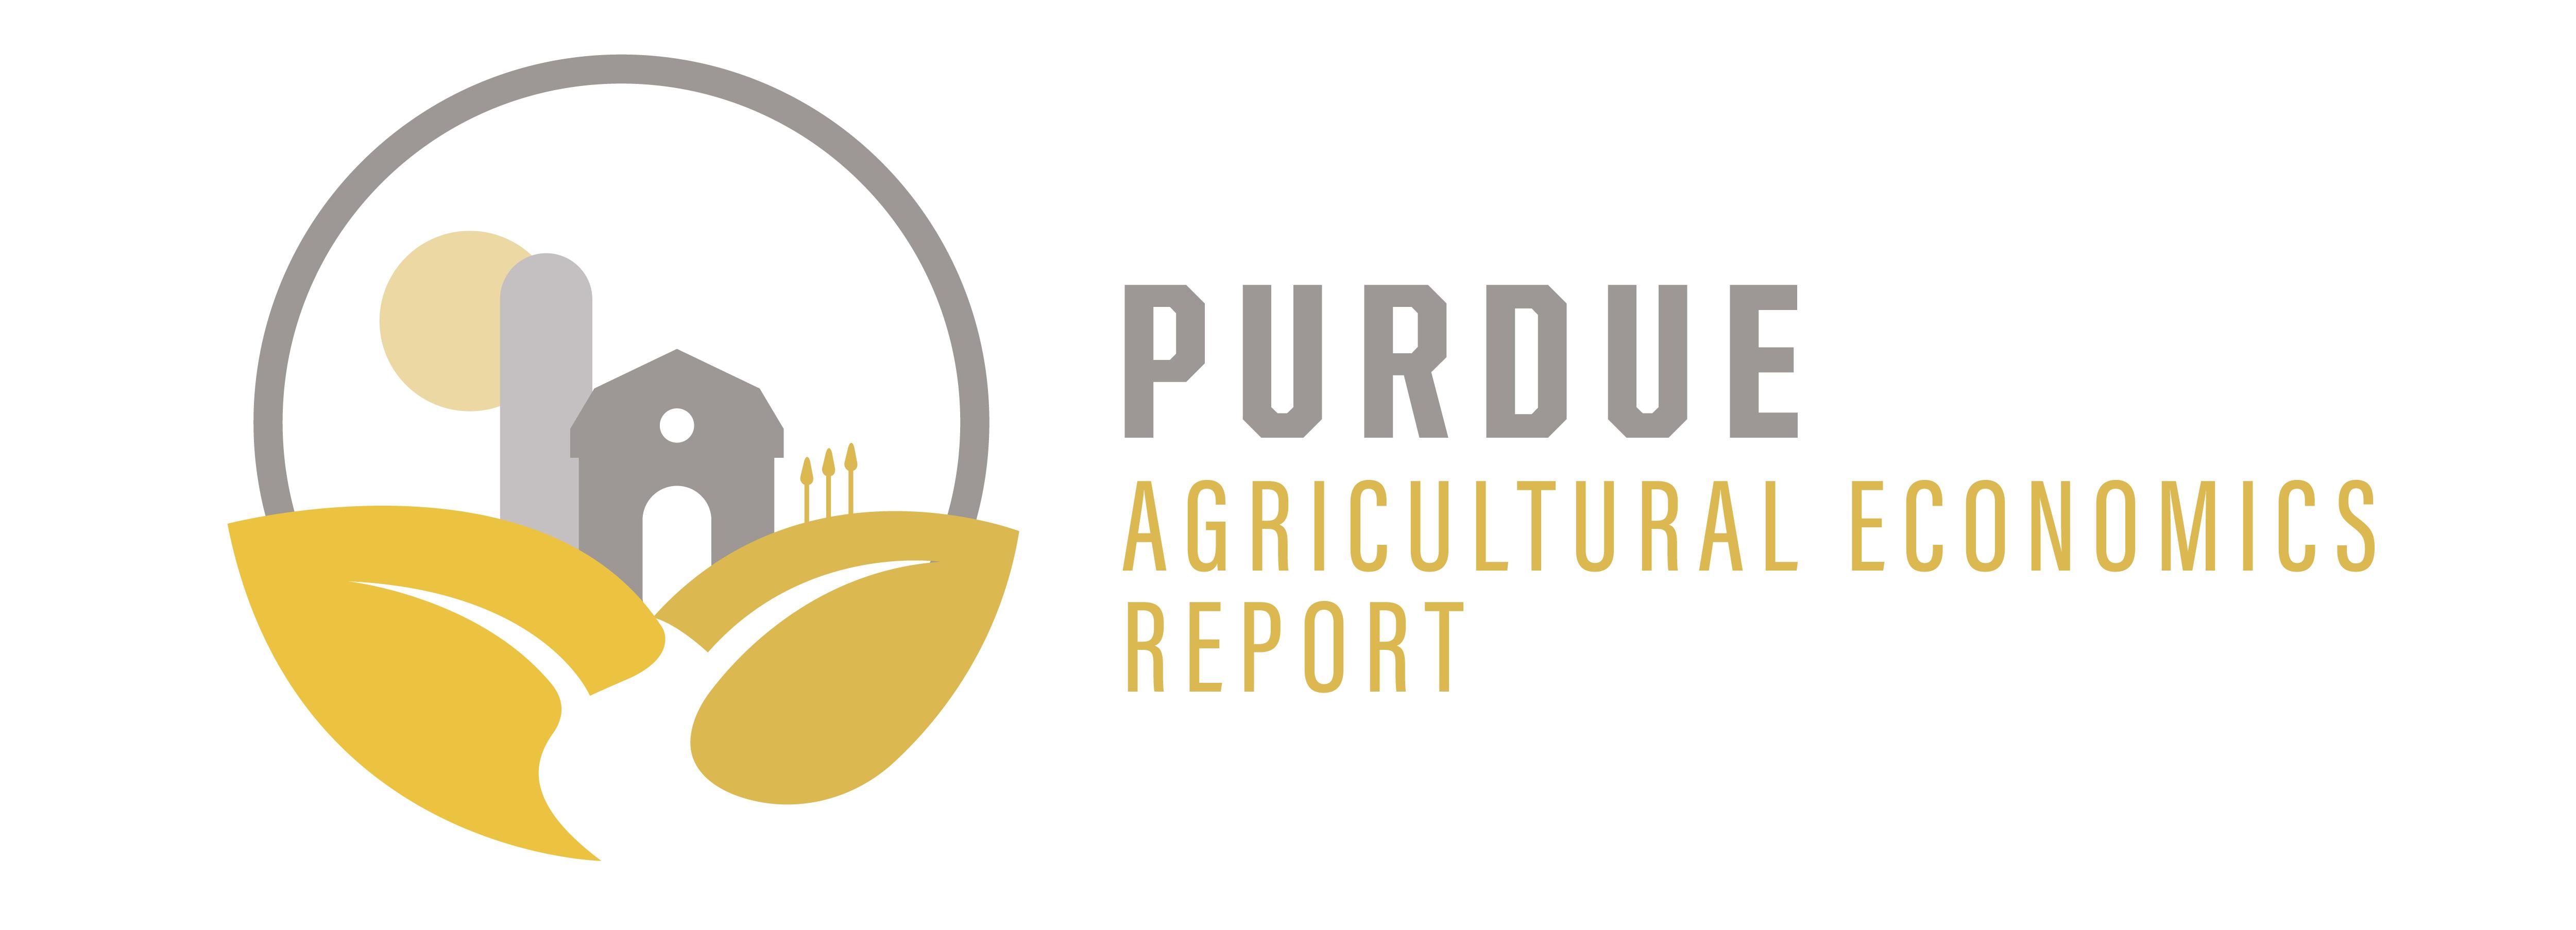 Purdue Agricultural Economics Report